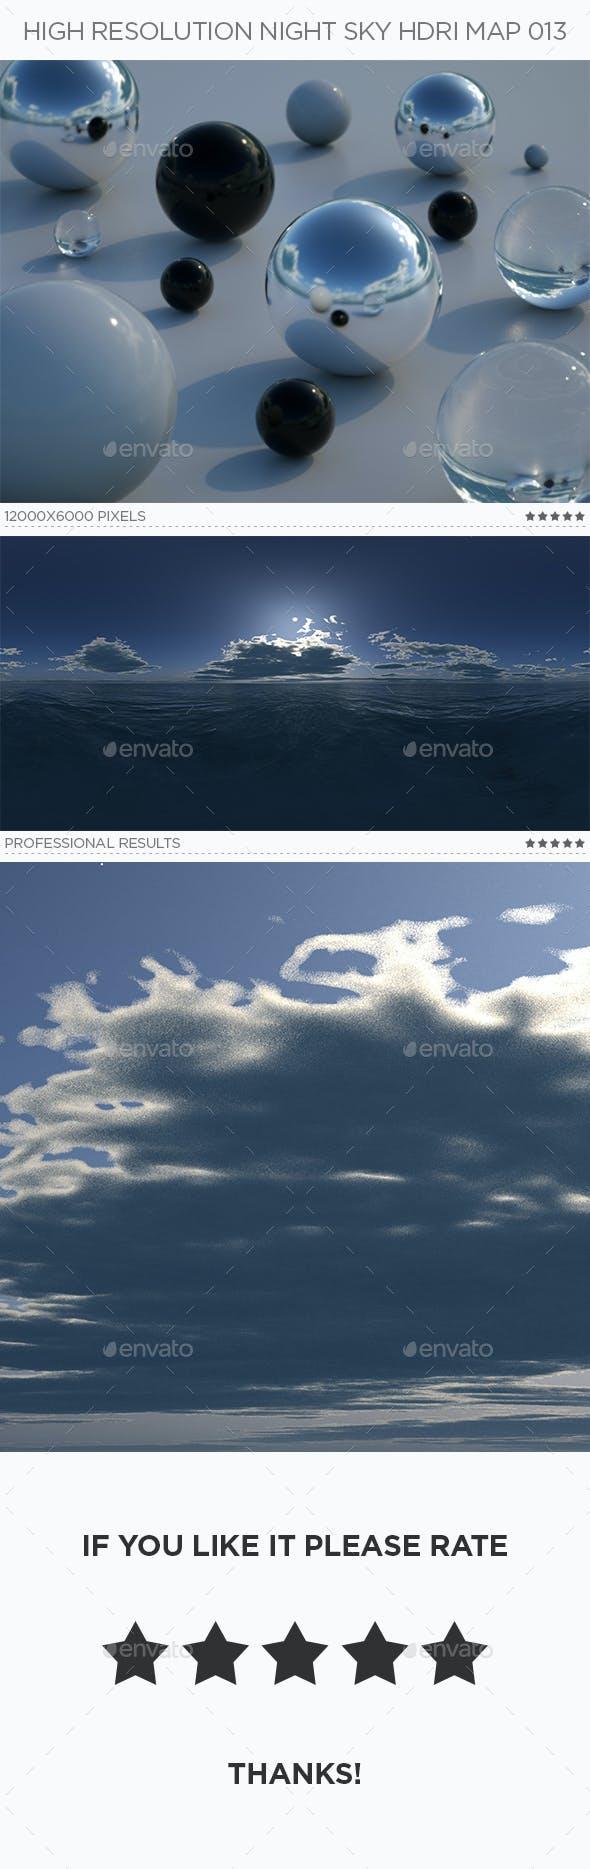 High Resolution Night Sky HDRi Map 013 - 3DOcean Item for Sale